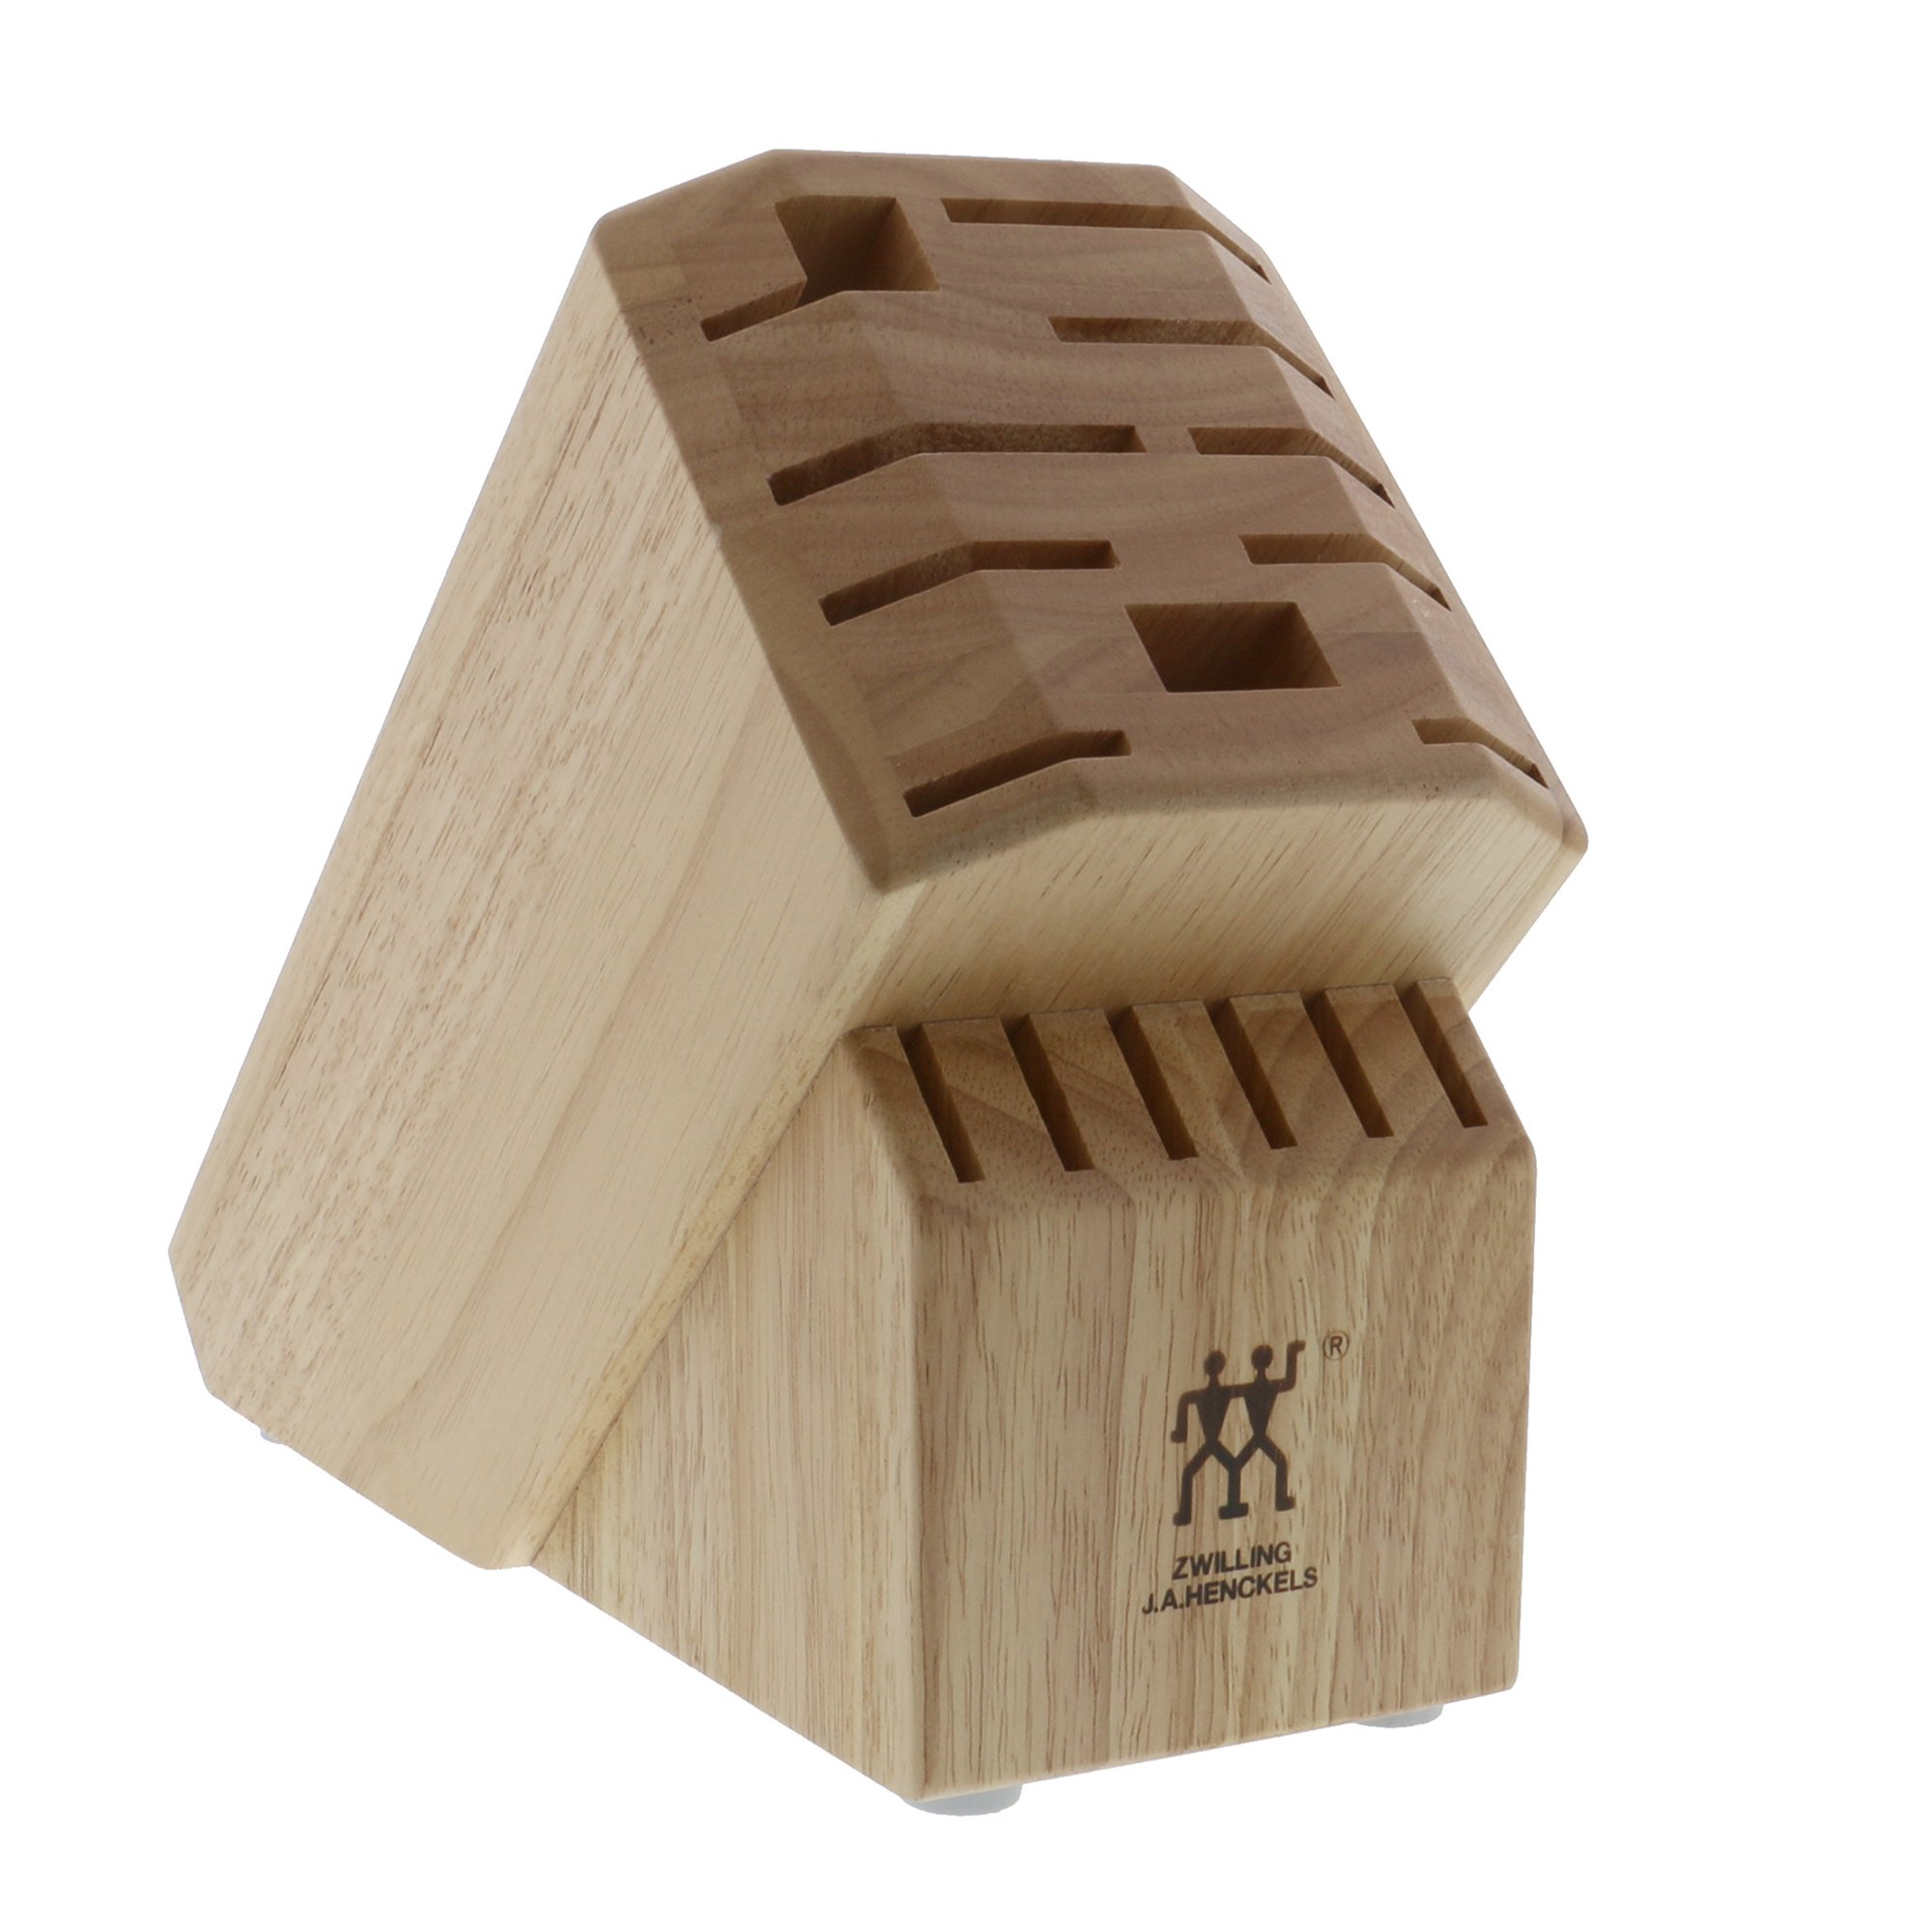 ZWILLING Pro 16-slot Knife Block - Rubberwood Natural